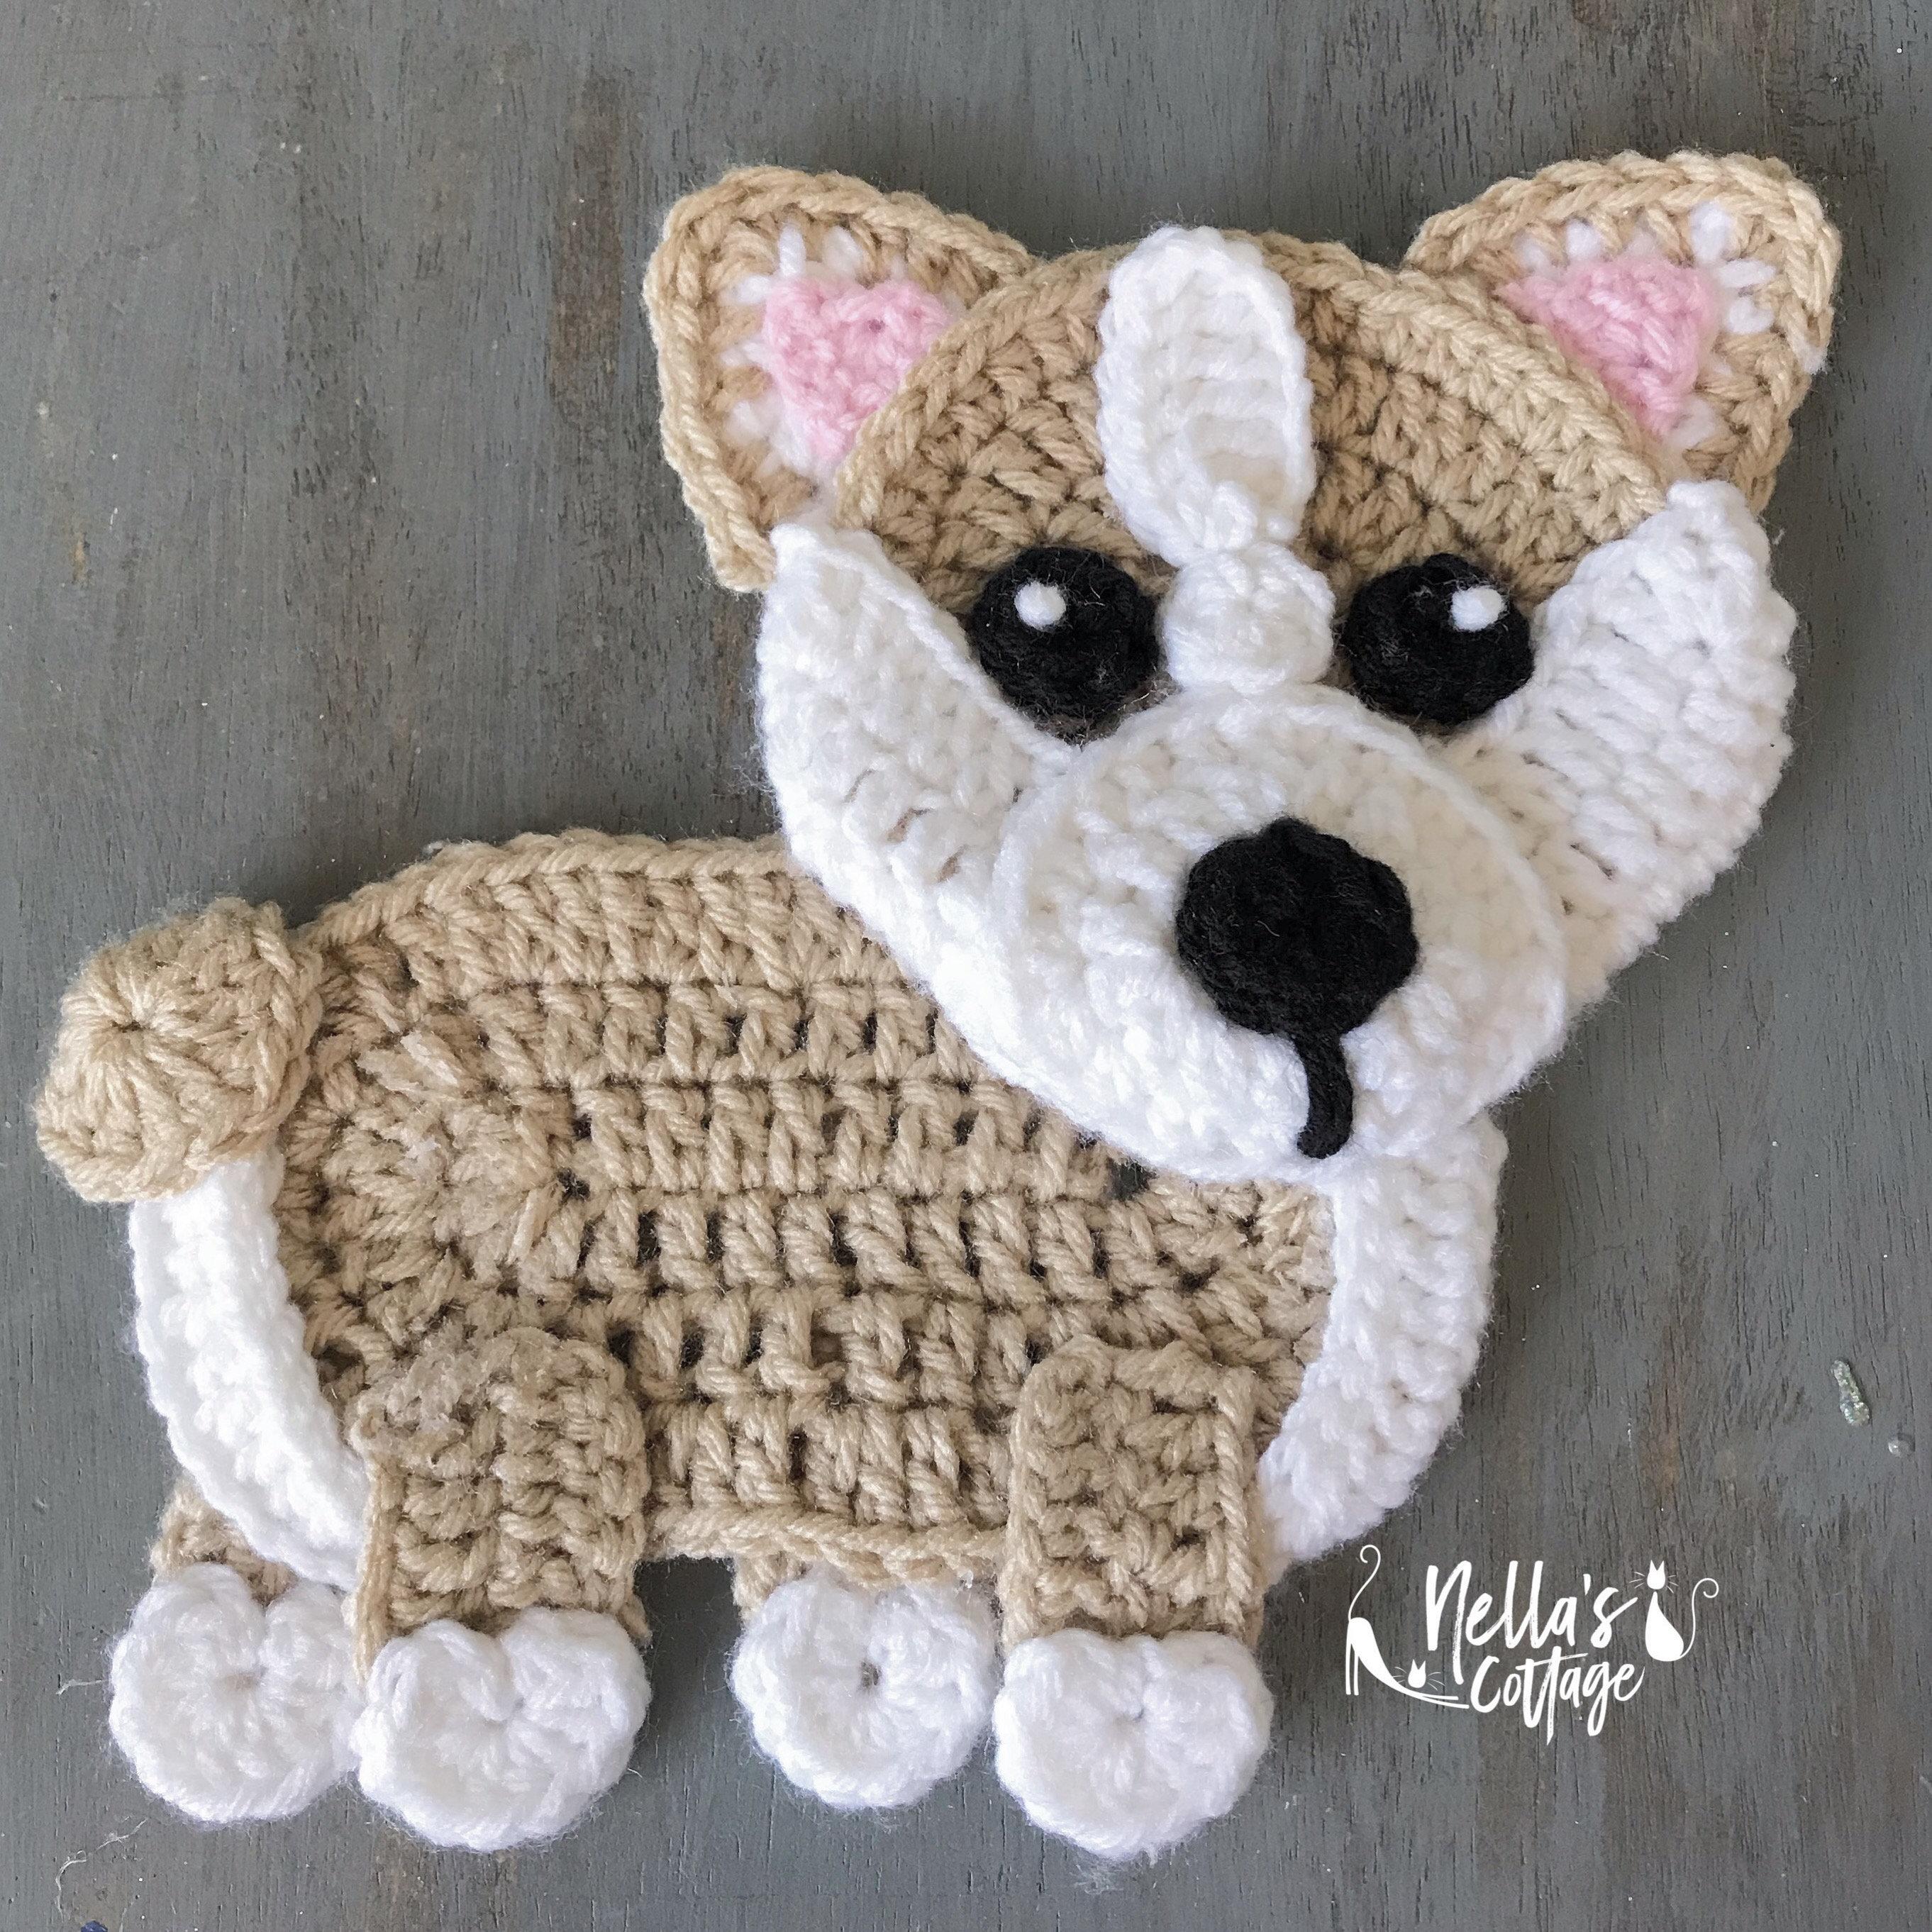 Corgi Dog Amigurumi - Free Crochet Pattern - StringyDingDing | 2724x2724